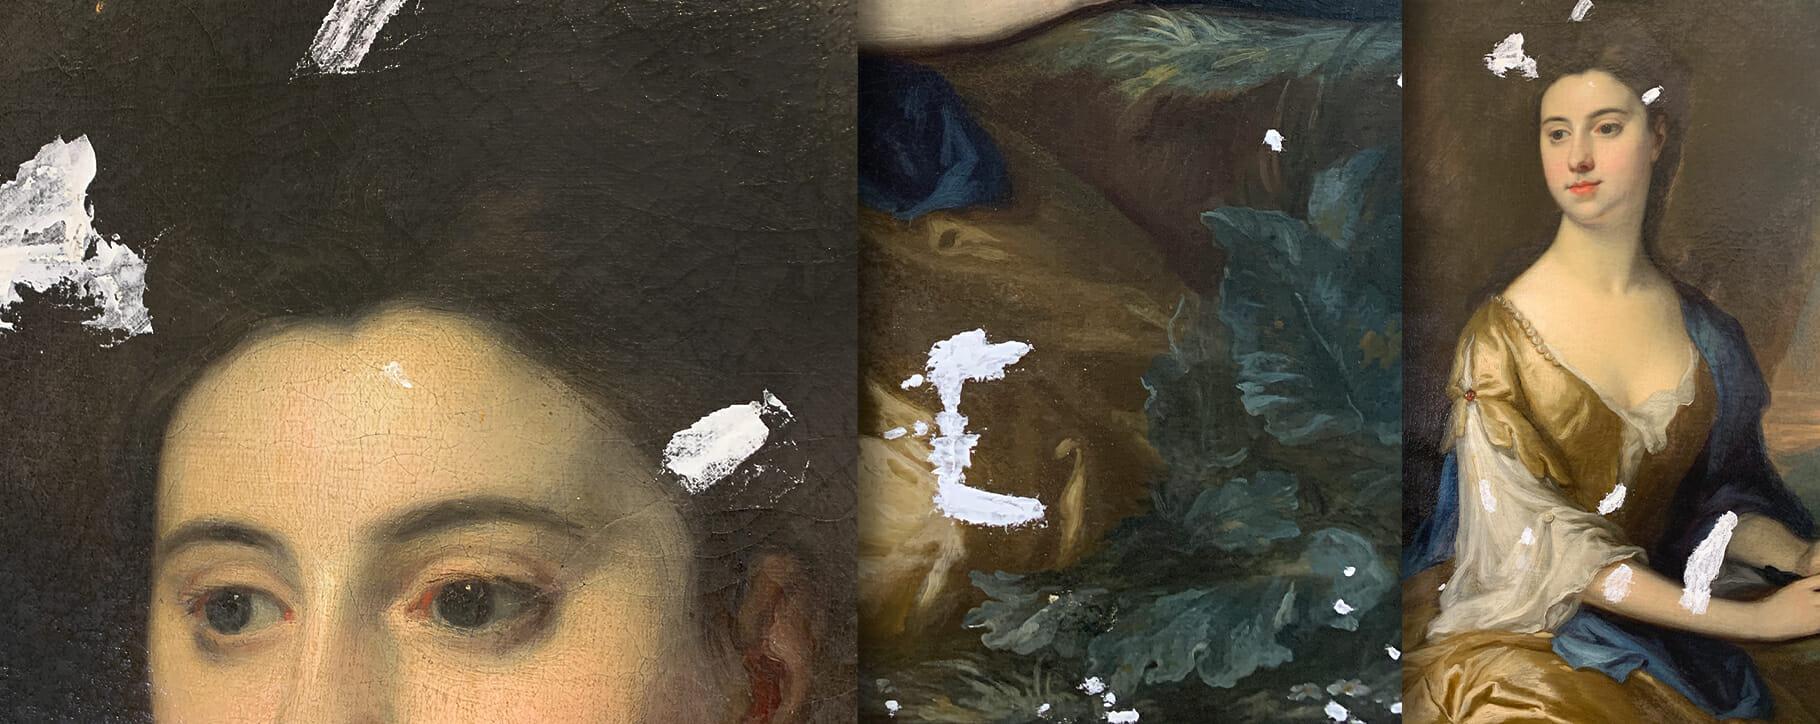 Kneller Portrait Consolidation